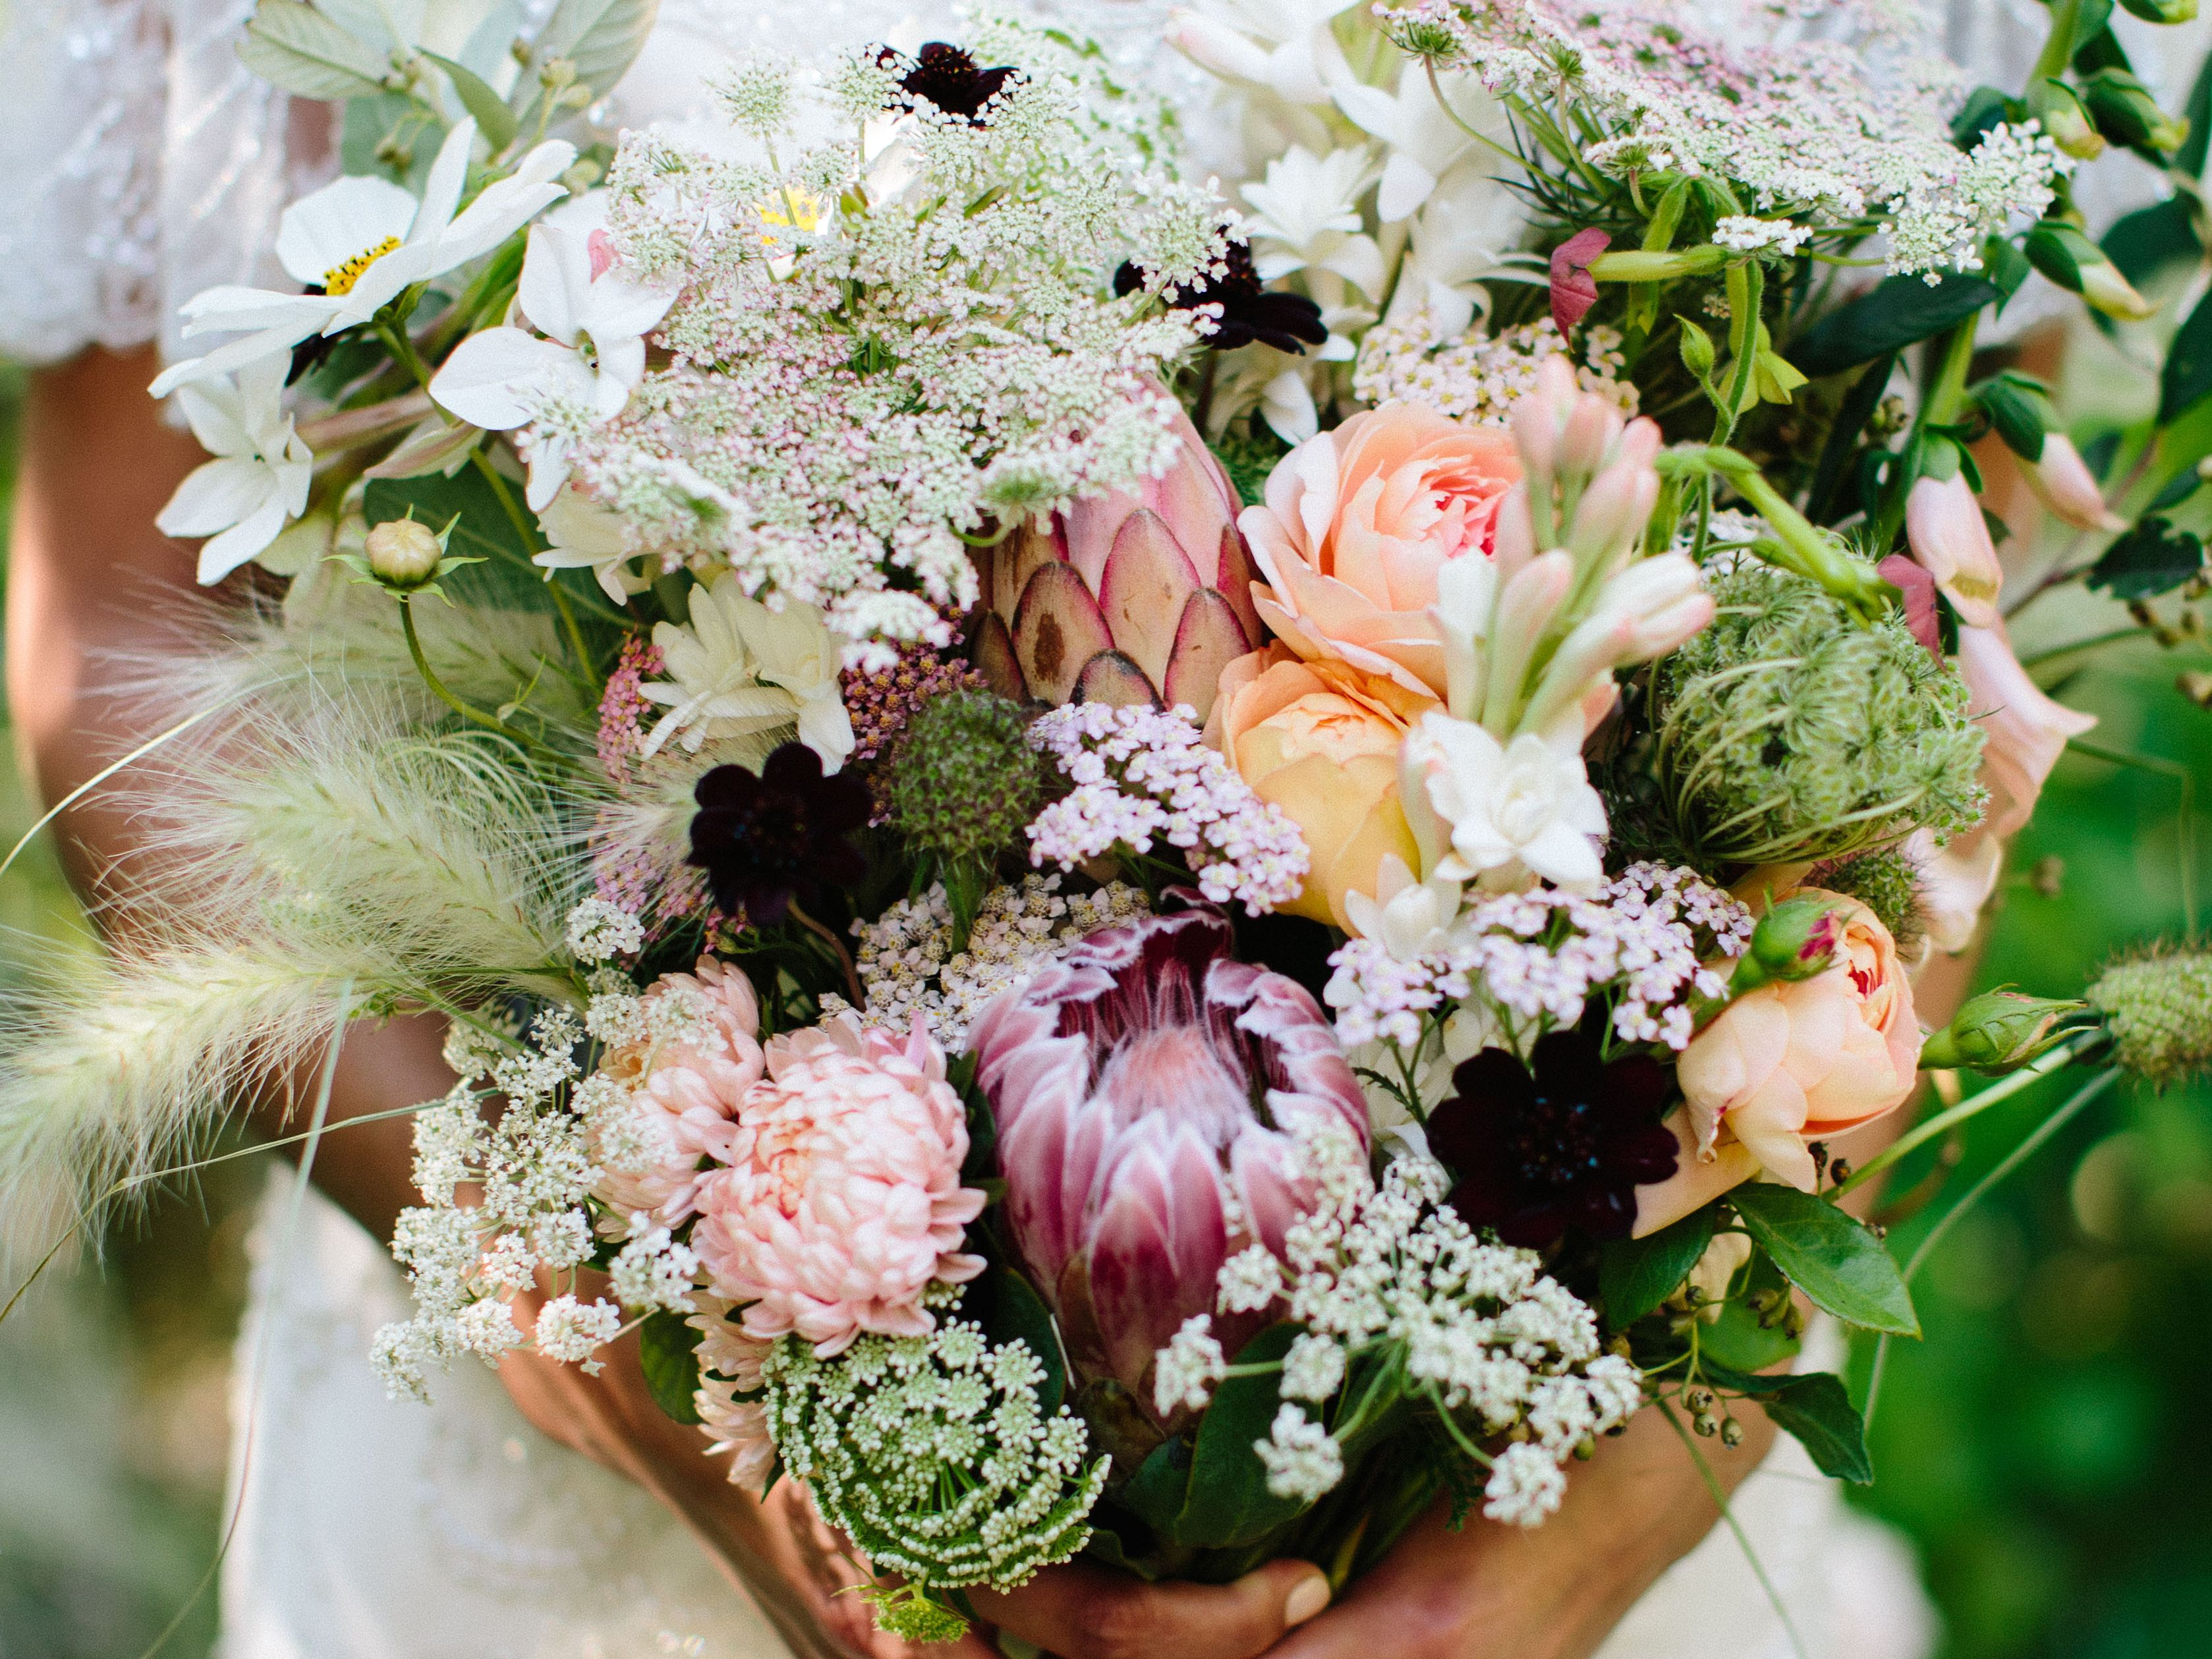 5 Wedding Bouquet Etiquette Questions Answered